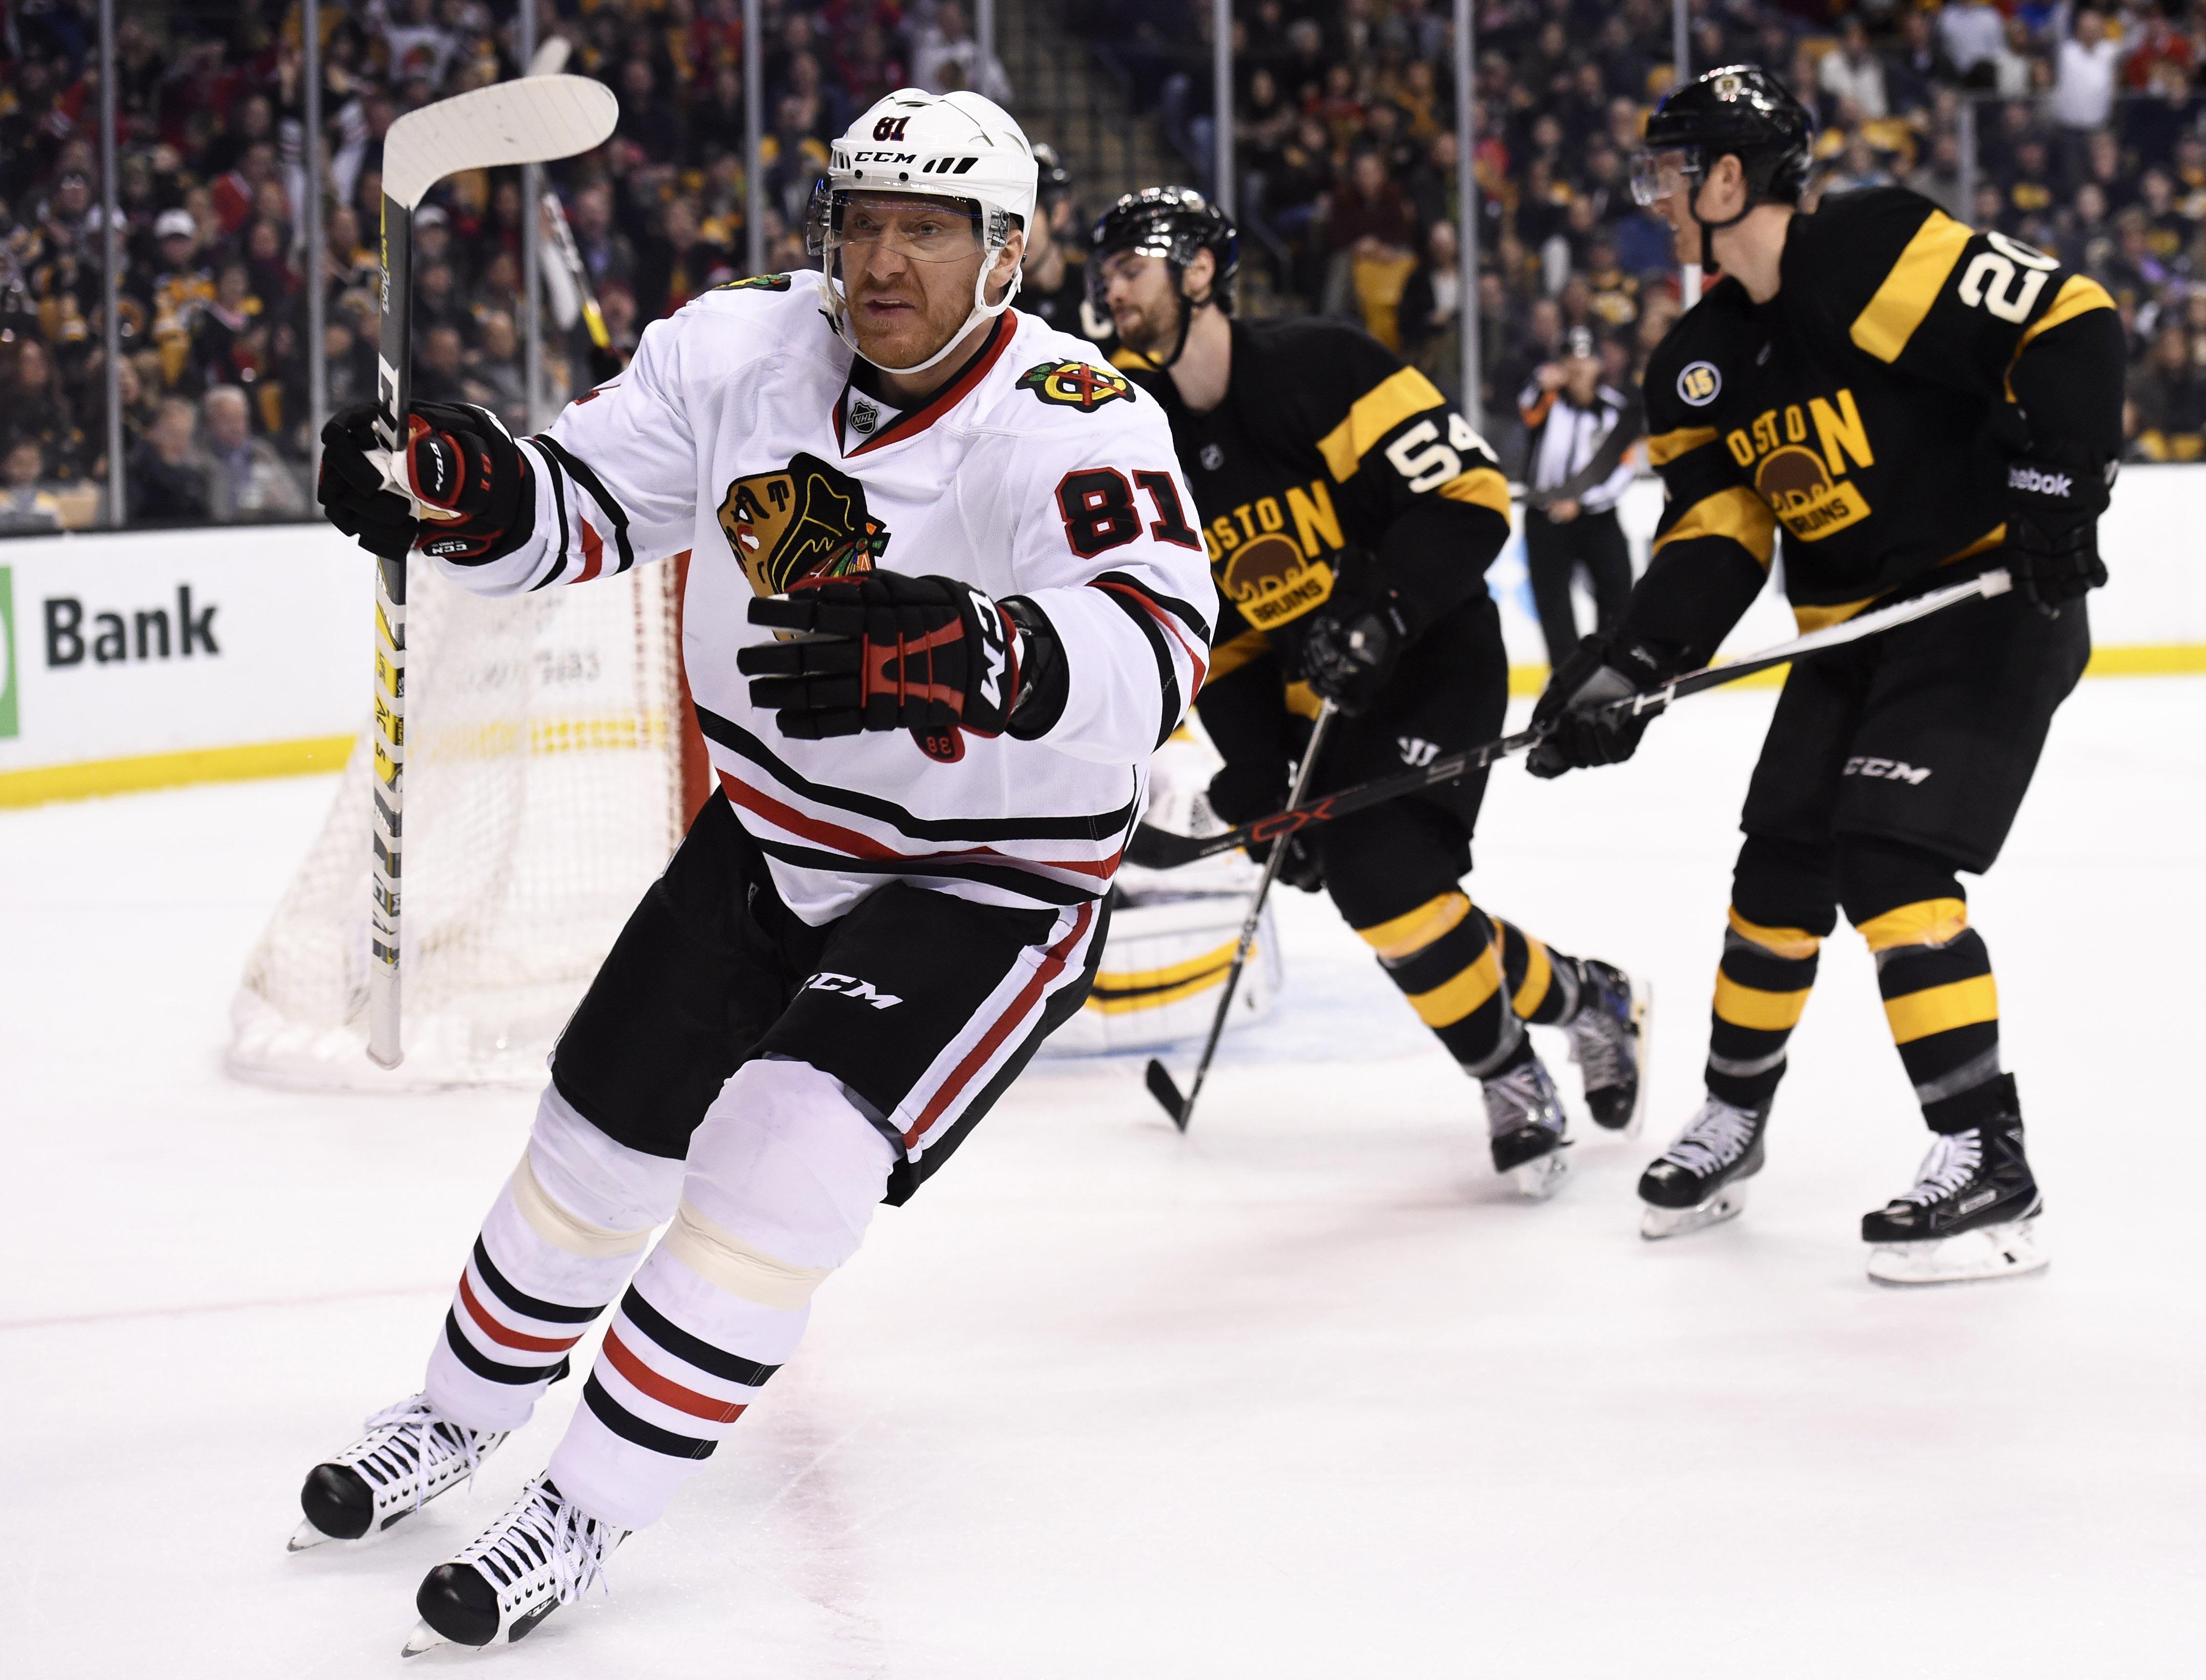 9826424-nhl-chicago-blackhawks-at-boston-bruins